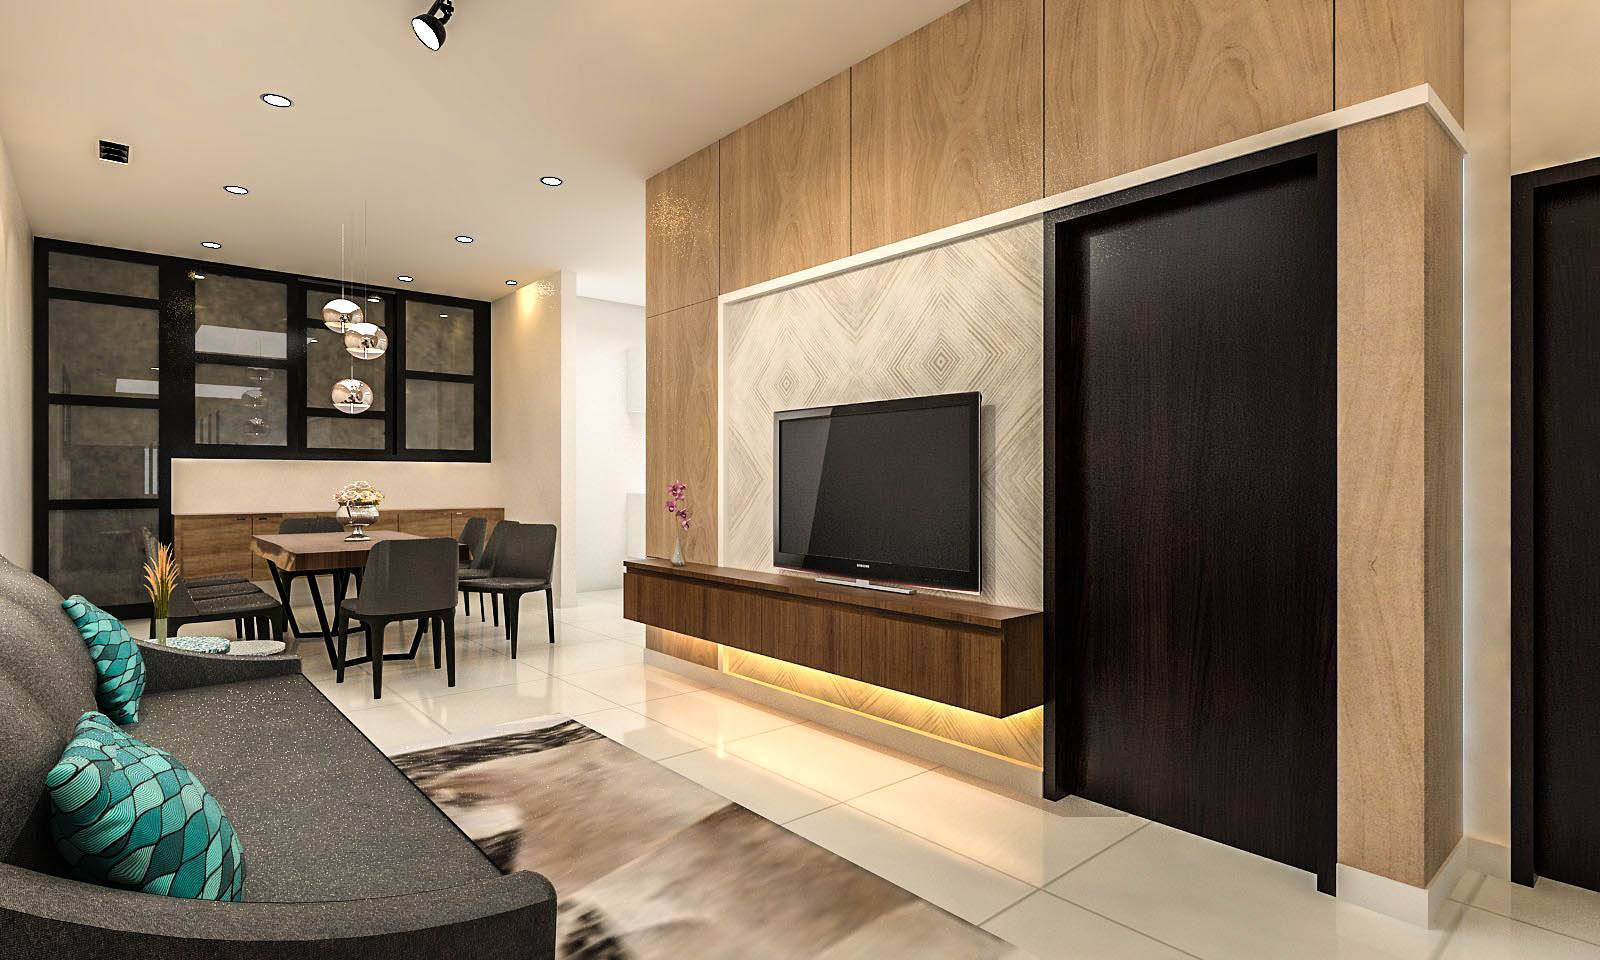 Graharupa Cipta Kirana Pluit Residence Pluit Sakti Pluit Sakti Living And Dining Room Modern  6808